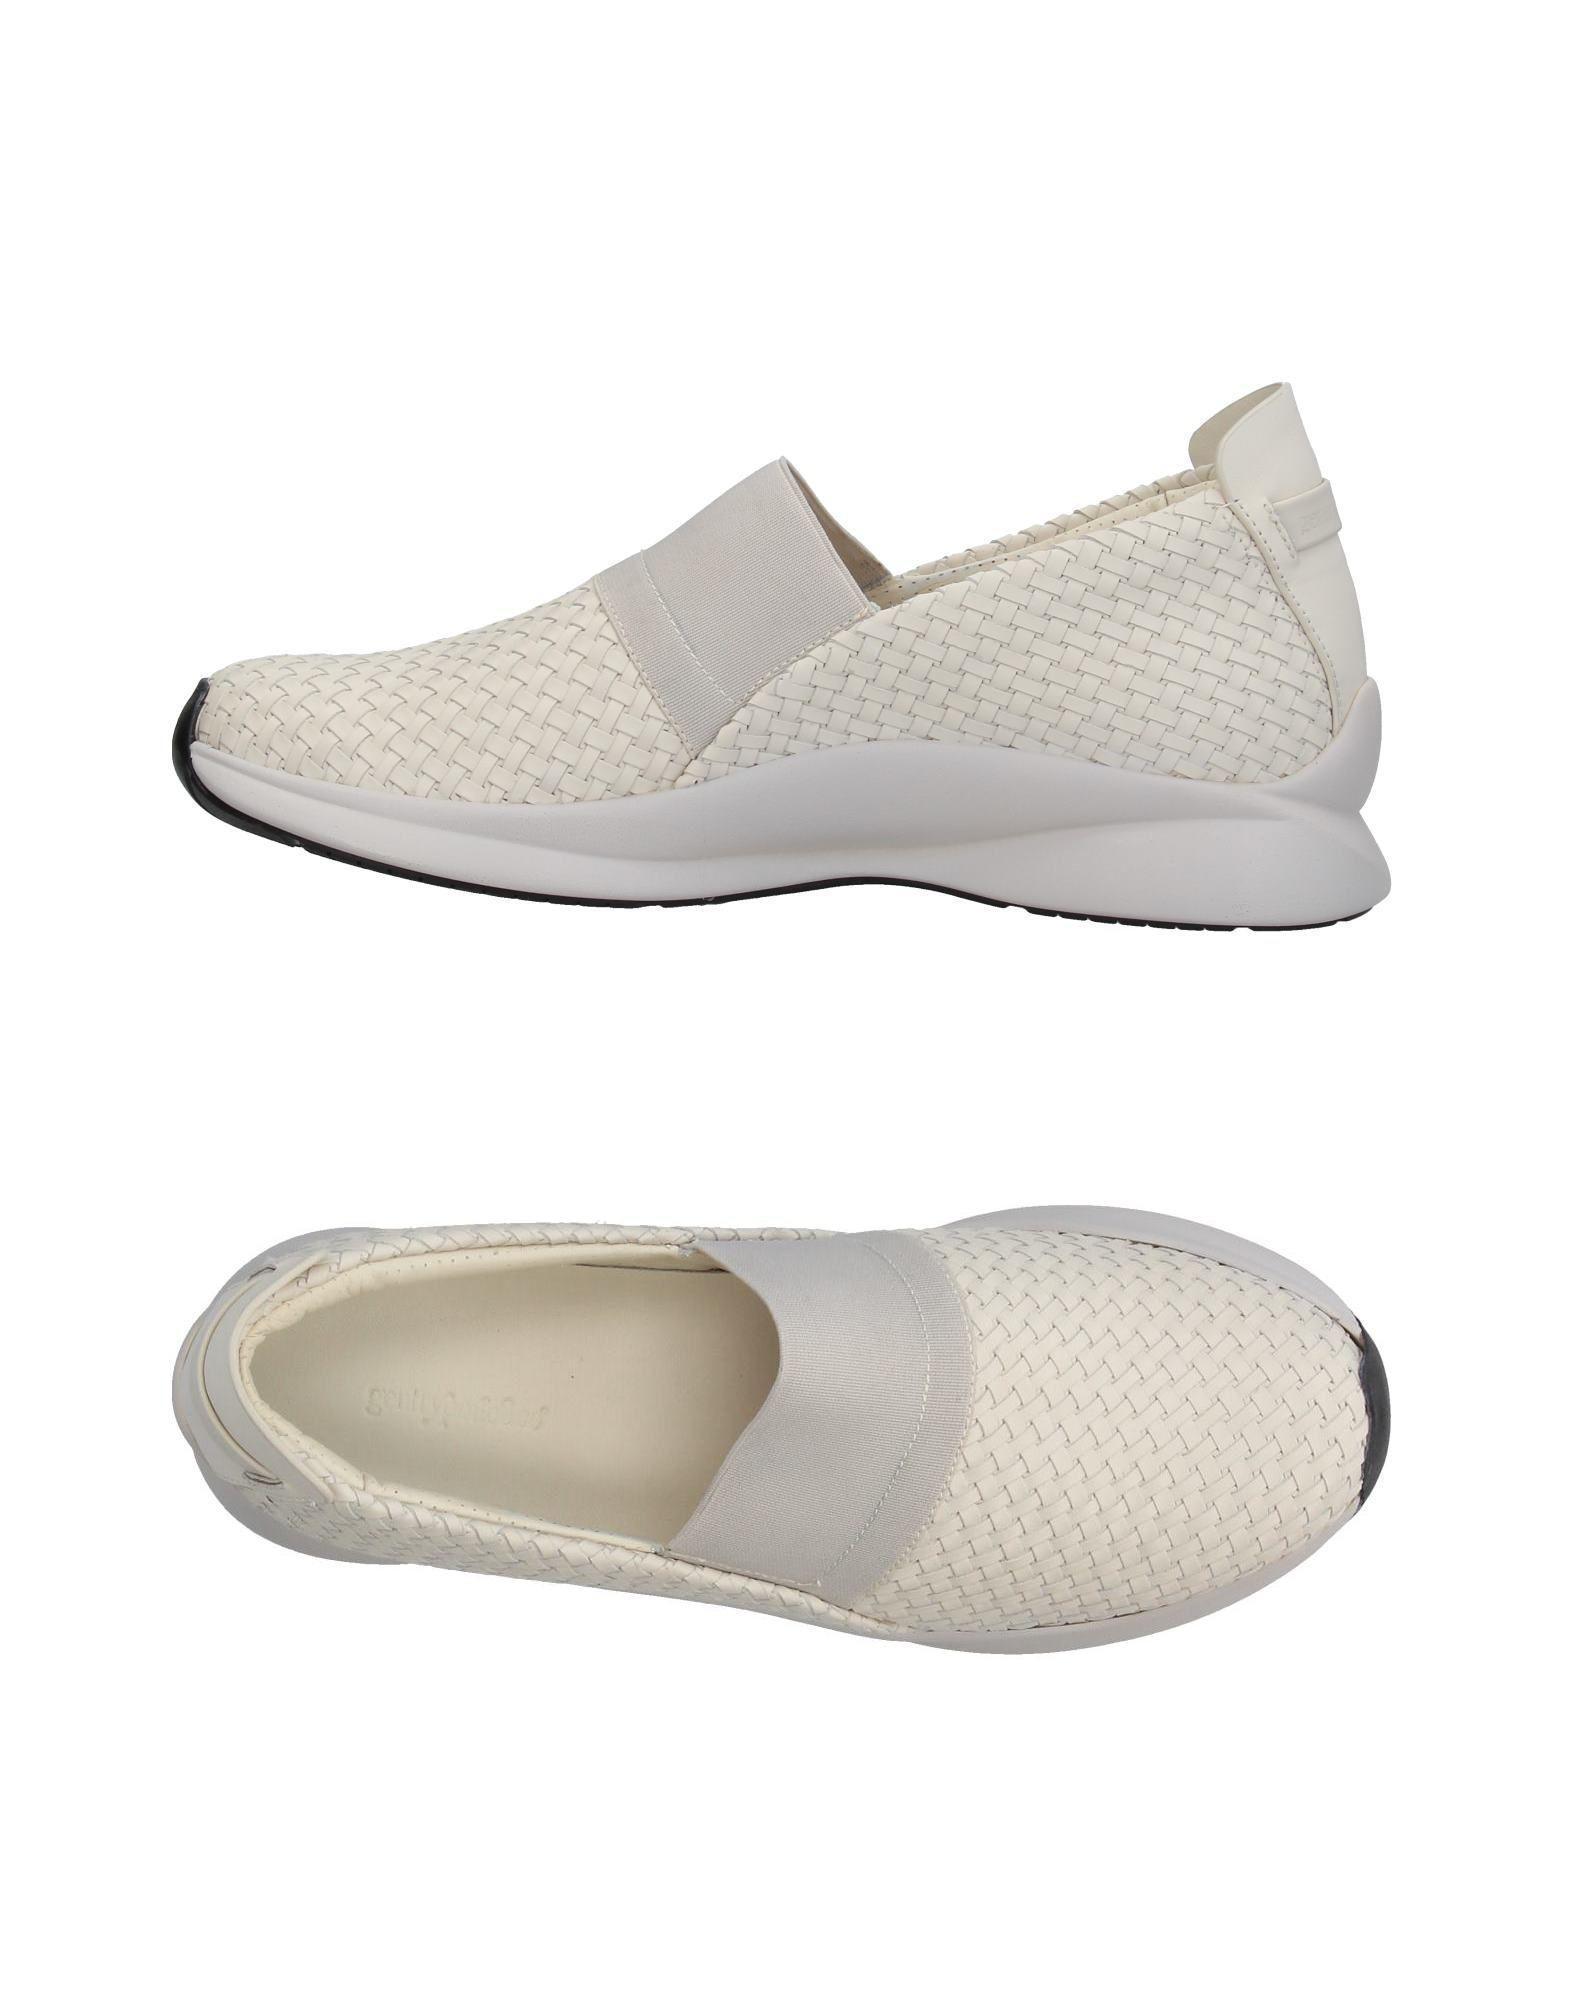 FOOTWEAR - Low-tops & sneakers Gentryportofino Manchester Online EaWeBQJH